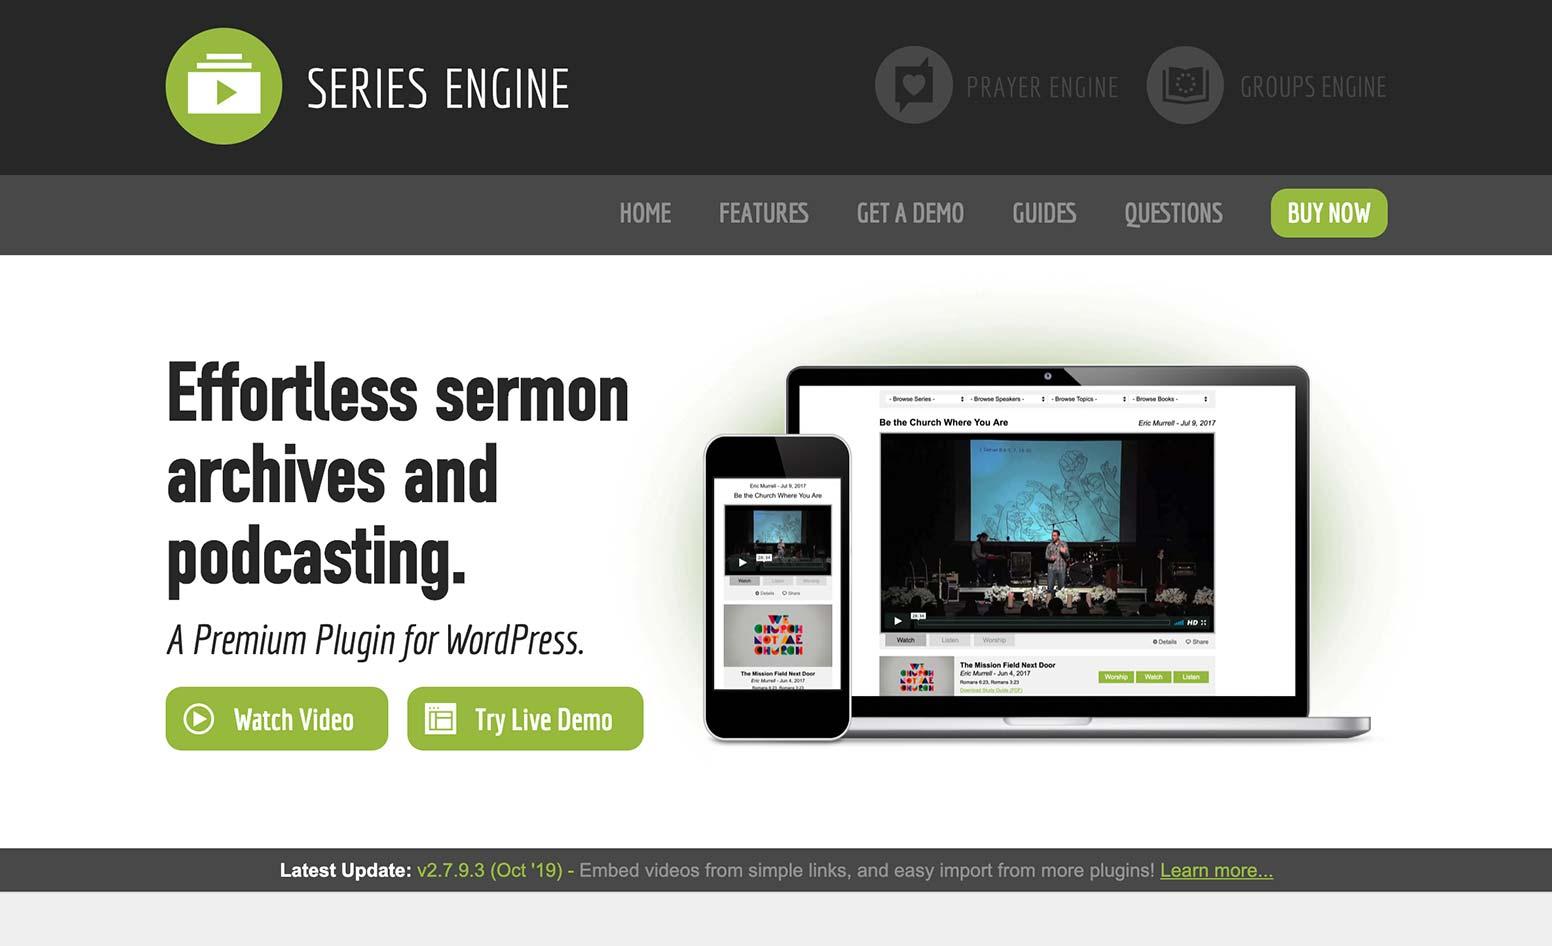 Series Engine WordPress Plugin